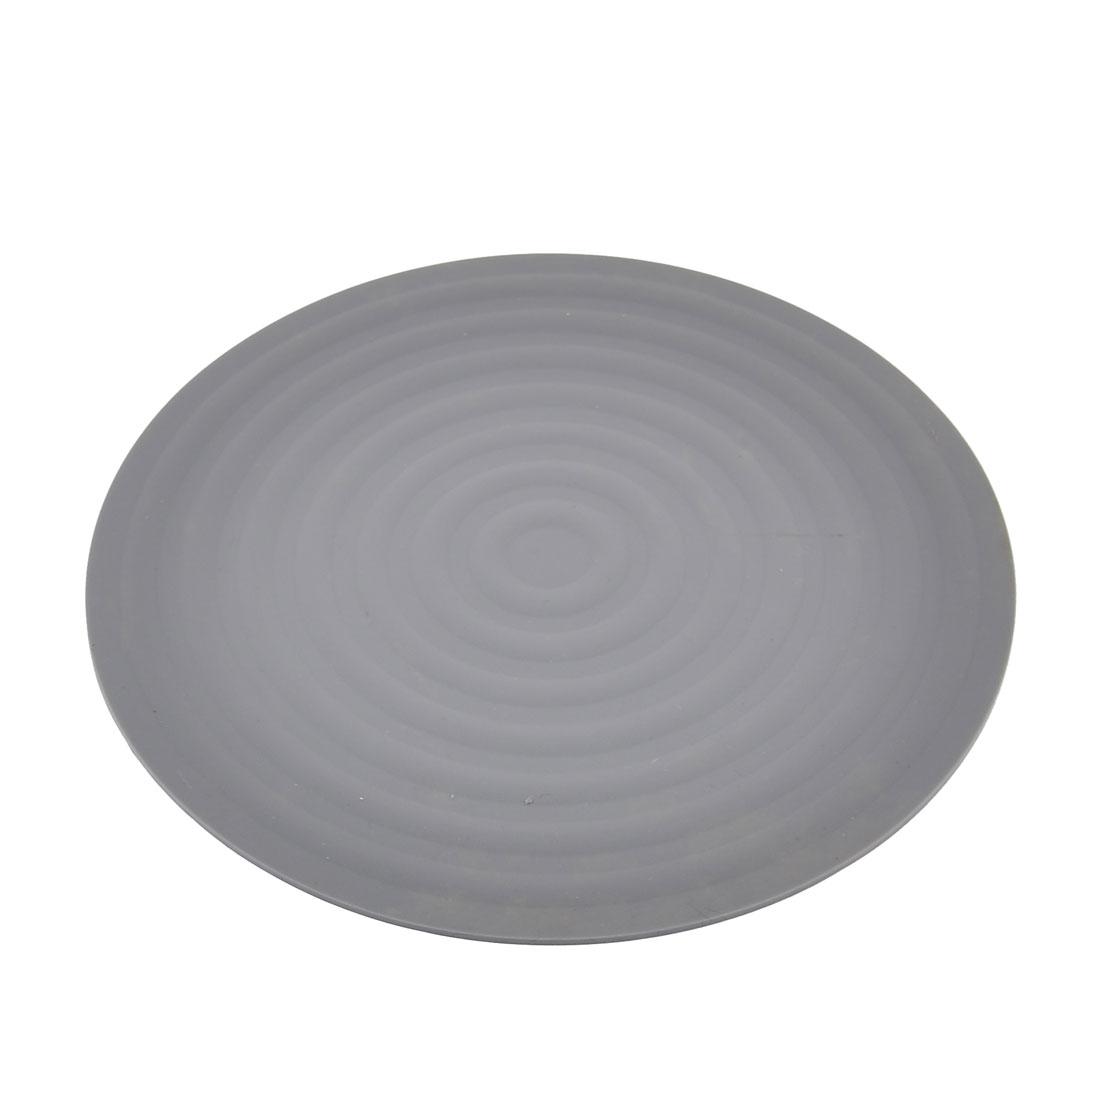 kitchen Rubber Round Shaped Nonslip Heat Resistant Pot Mat Pad Holder Gray